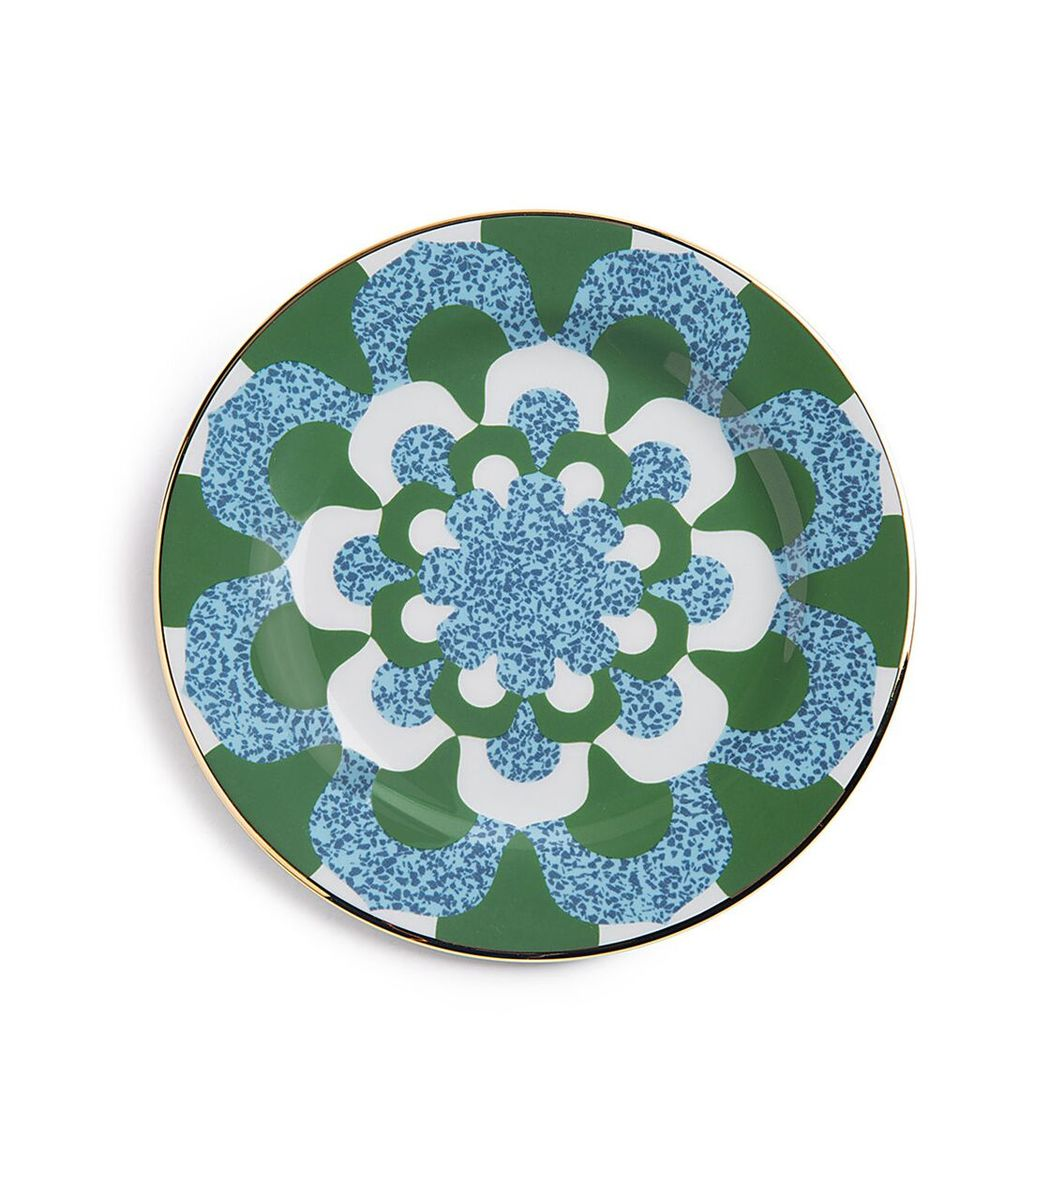 LA DOUBLEJ Blue/Green Housewives Mosaico Blu Dessert Plates (Set of 2)